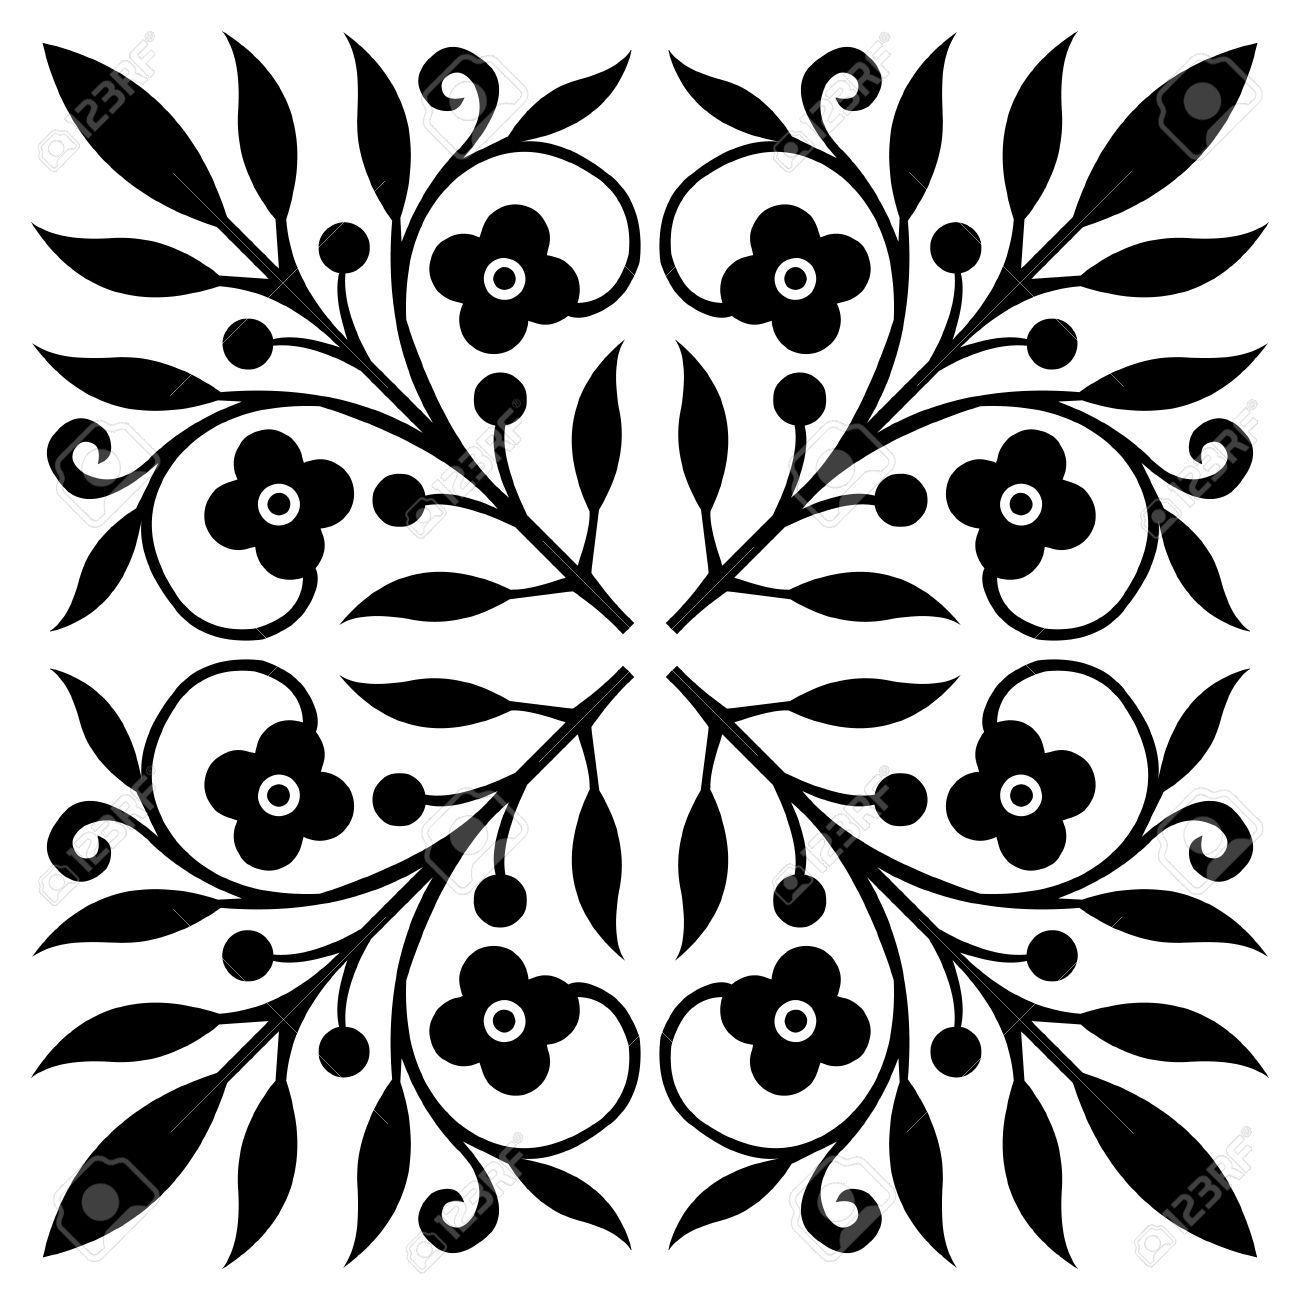 floral stencil patterns - Google Search | Advent ideas | Pinterest